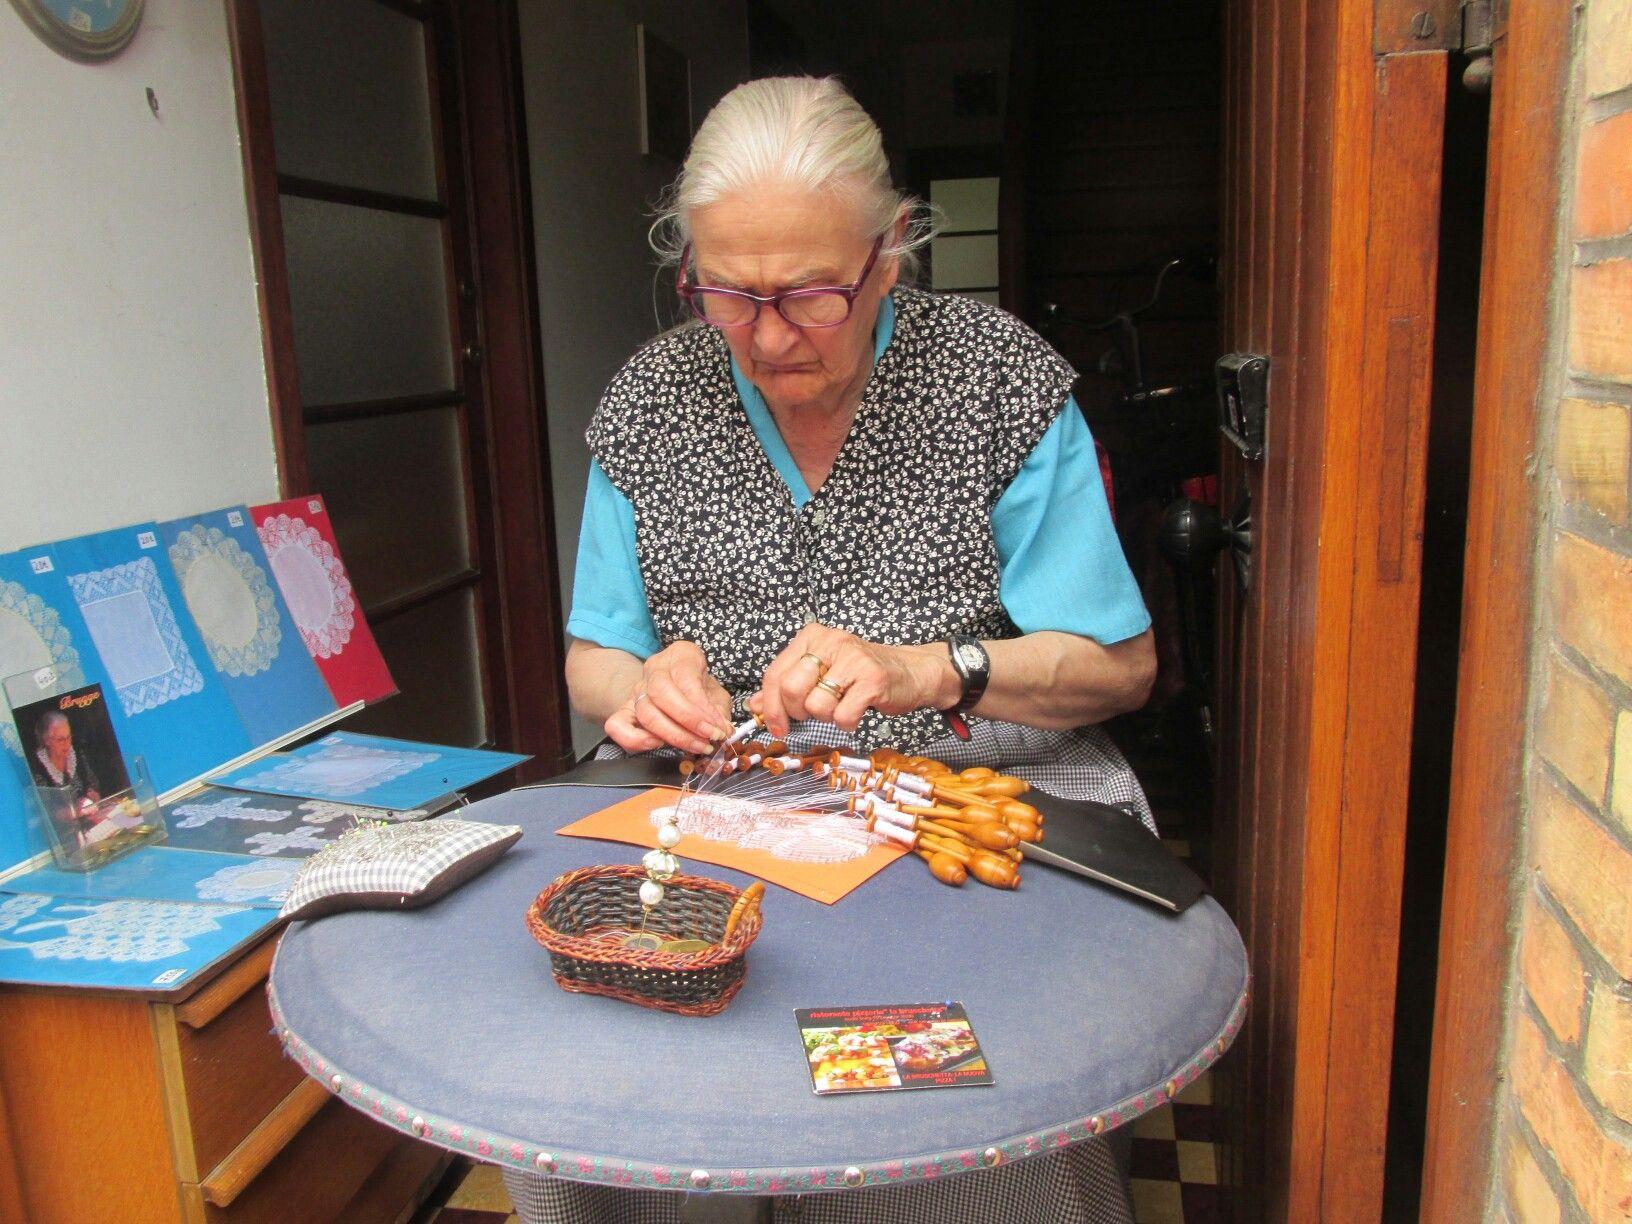 Artesana de encajes en Brujas, Belgica